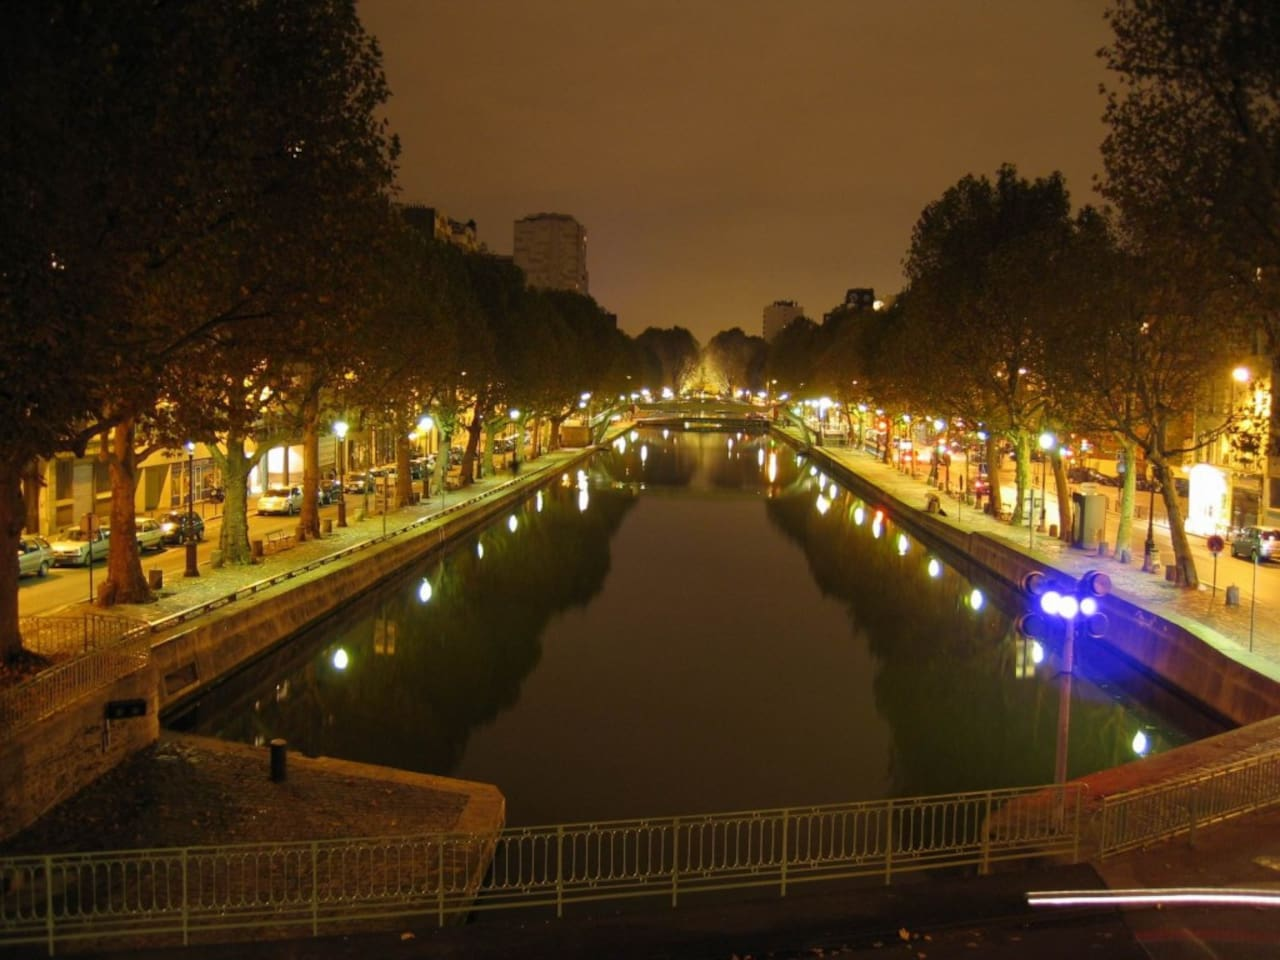 Canal saint martin - designed flat